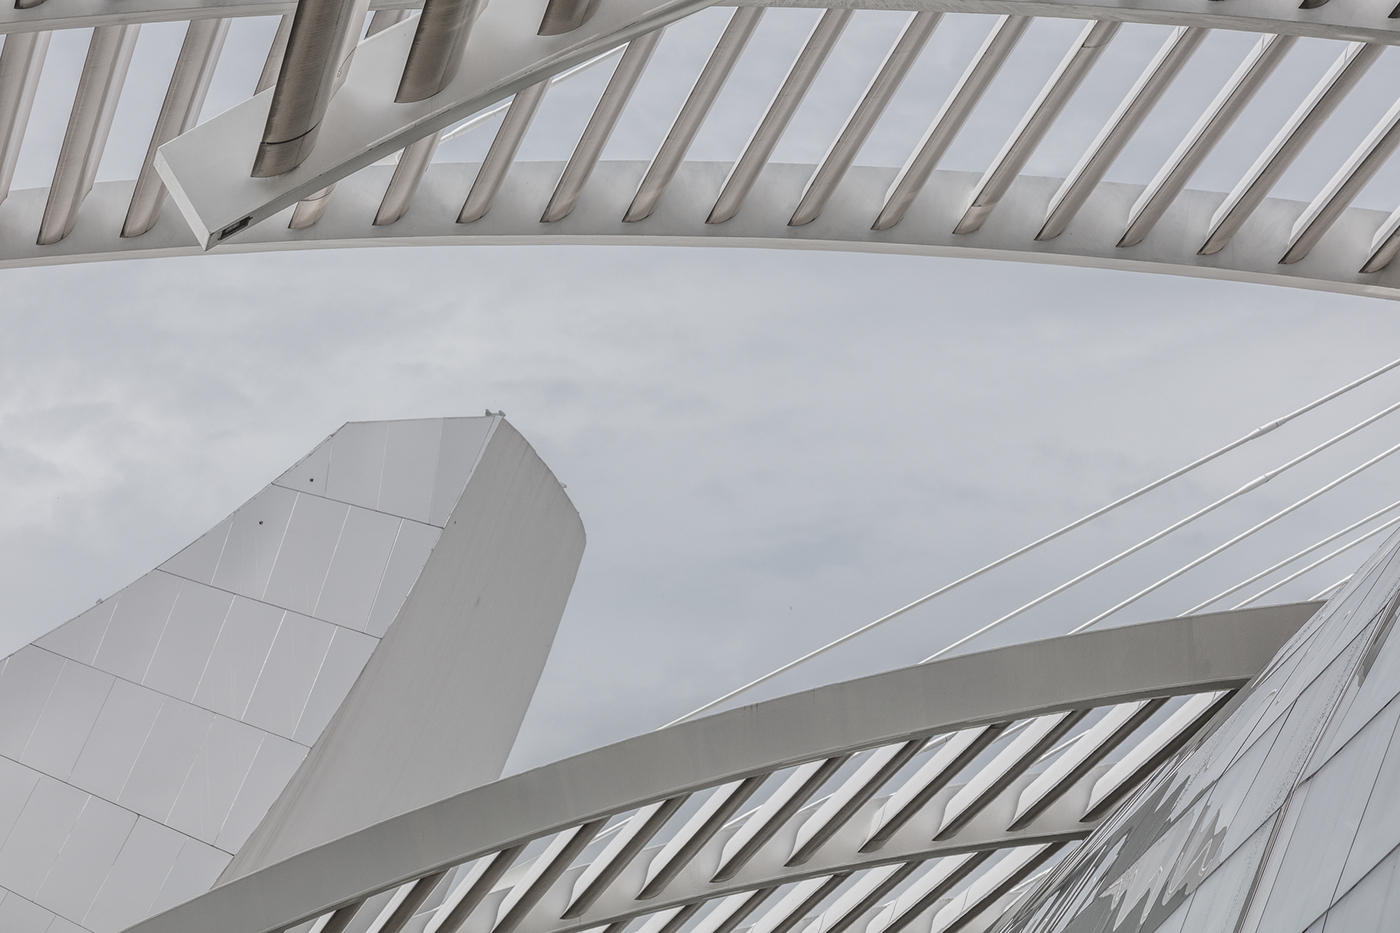 singapore buildings highrise construction marina bay ARCHETECTURE ArtScience Museum esplanade singapore flyer